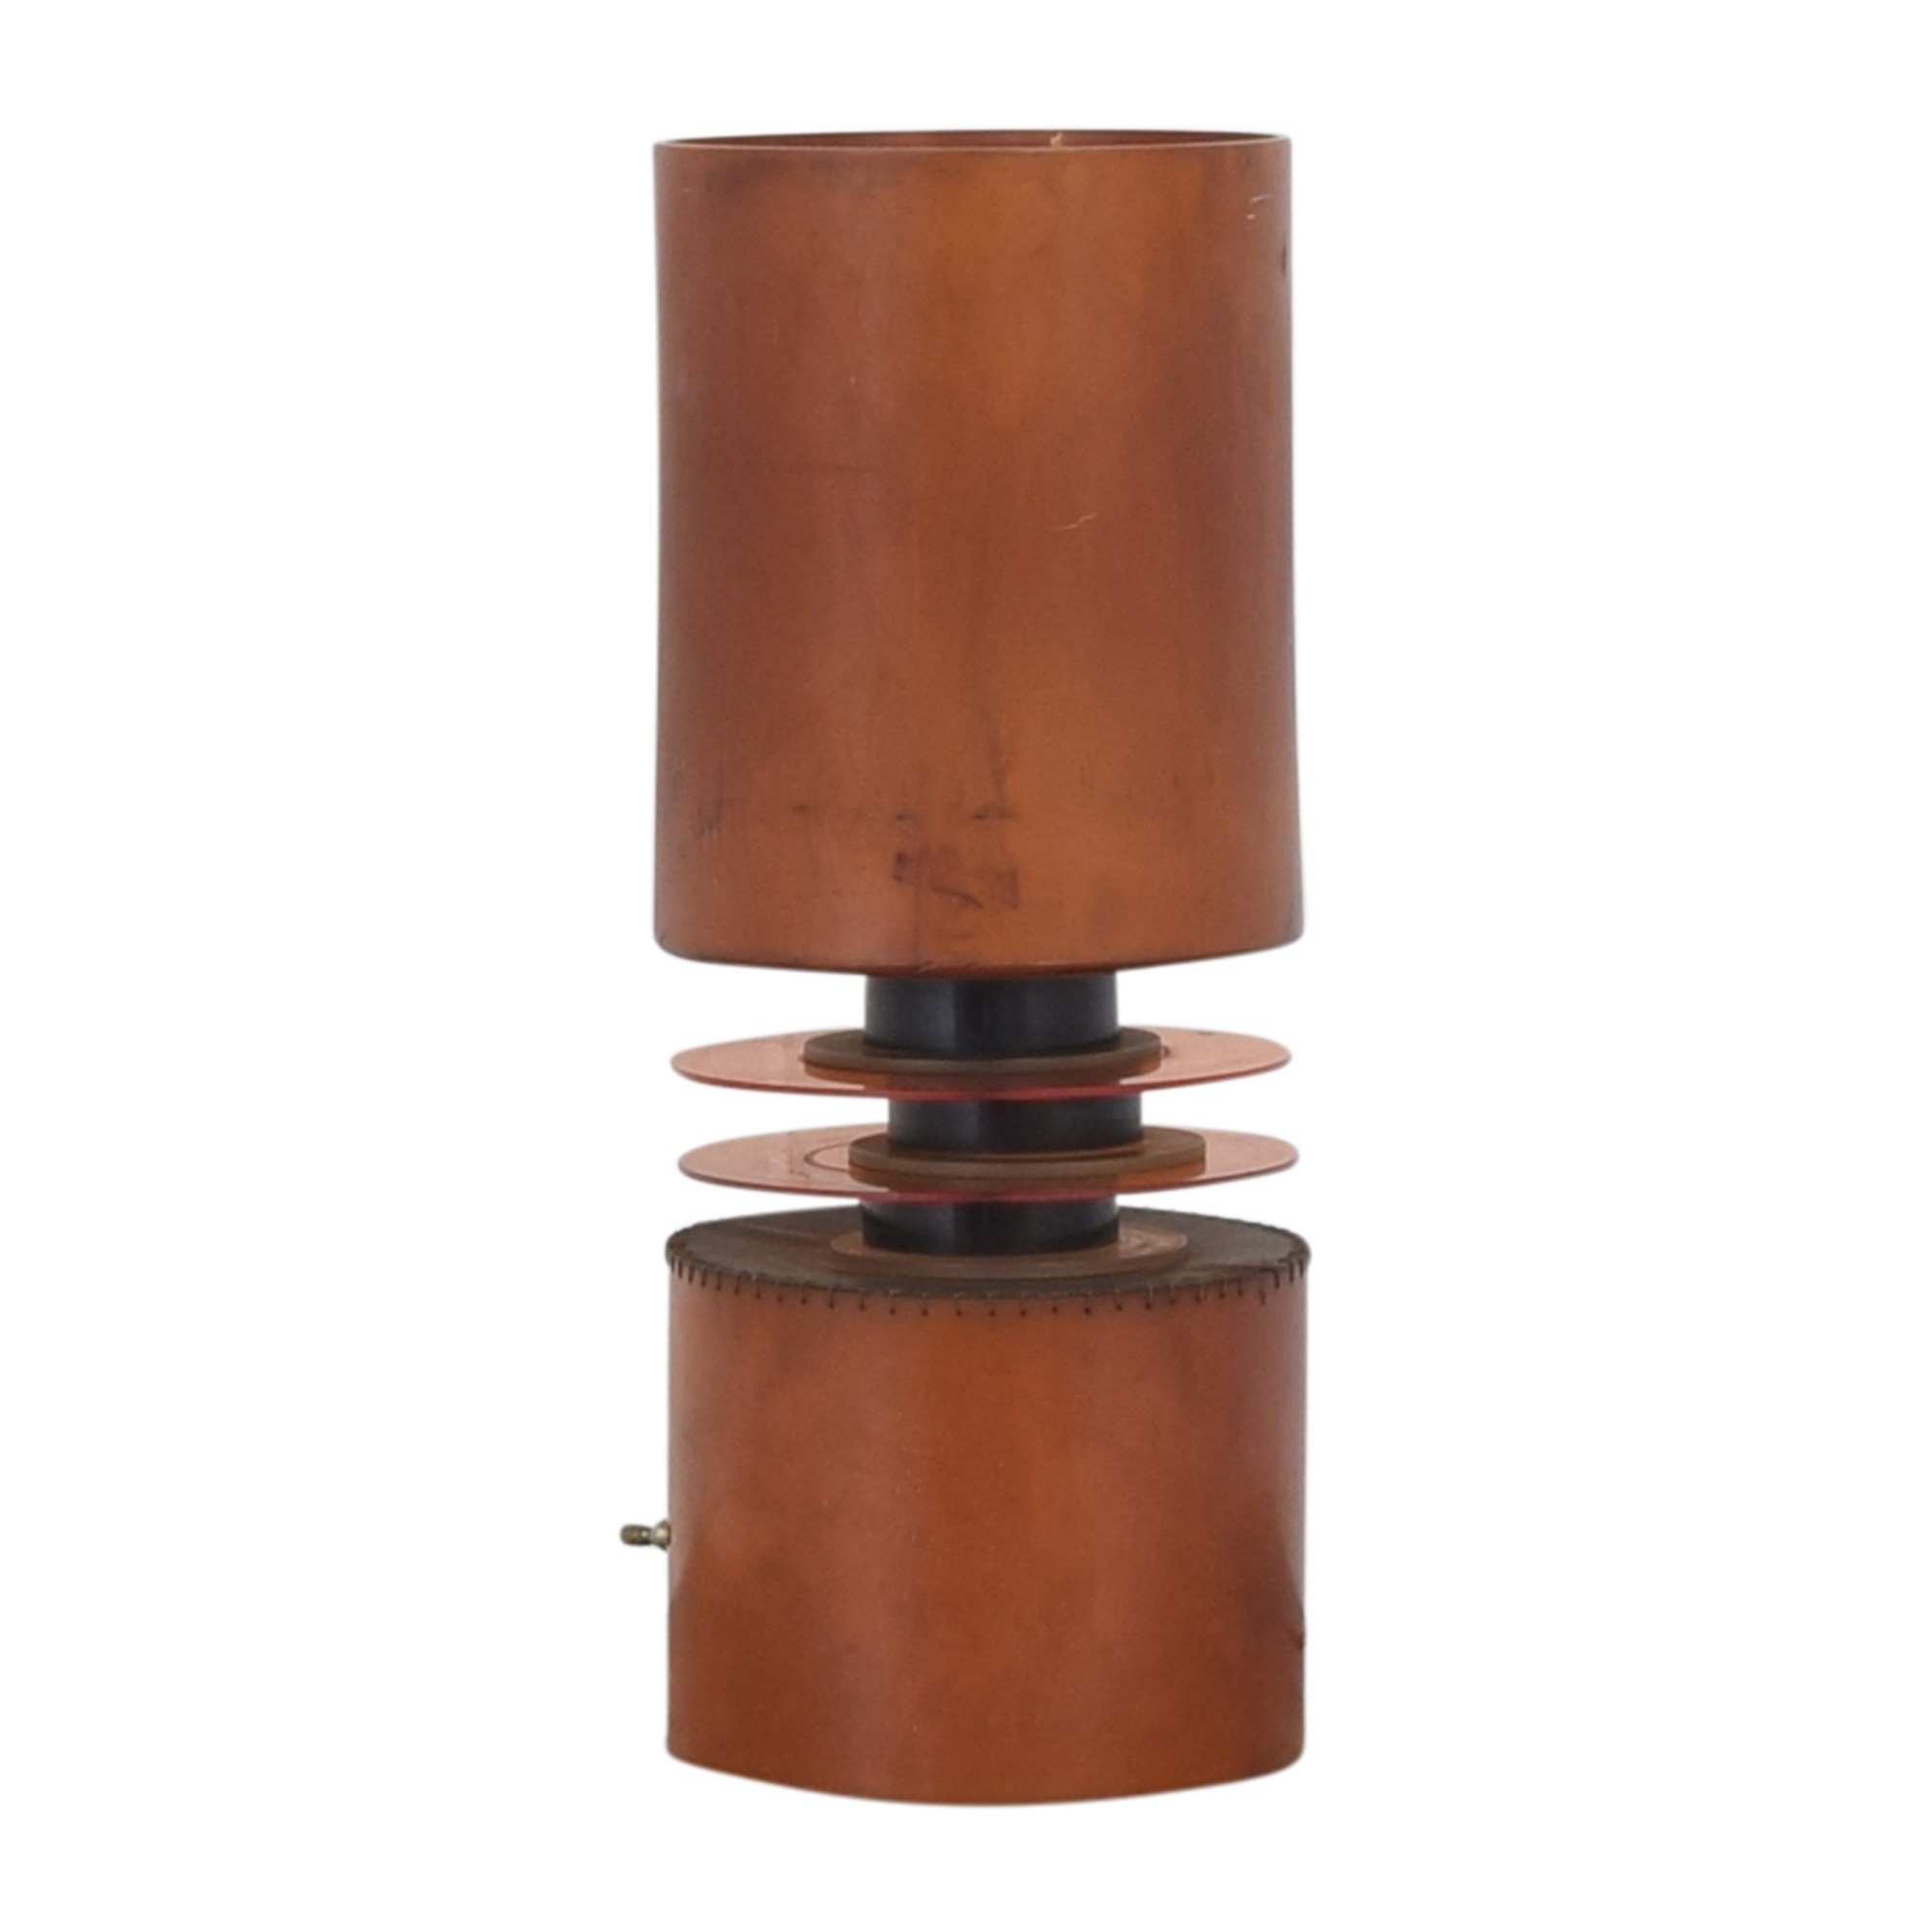 Cylindrical Table Lamp Decor